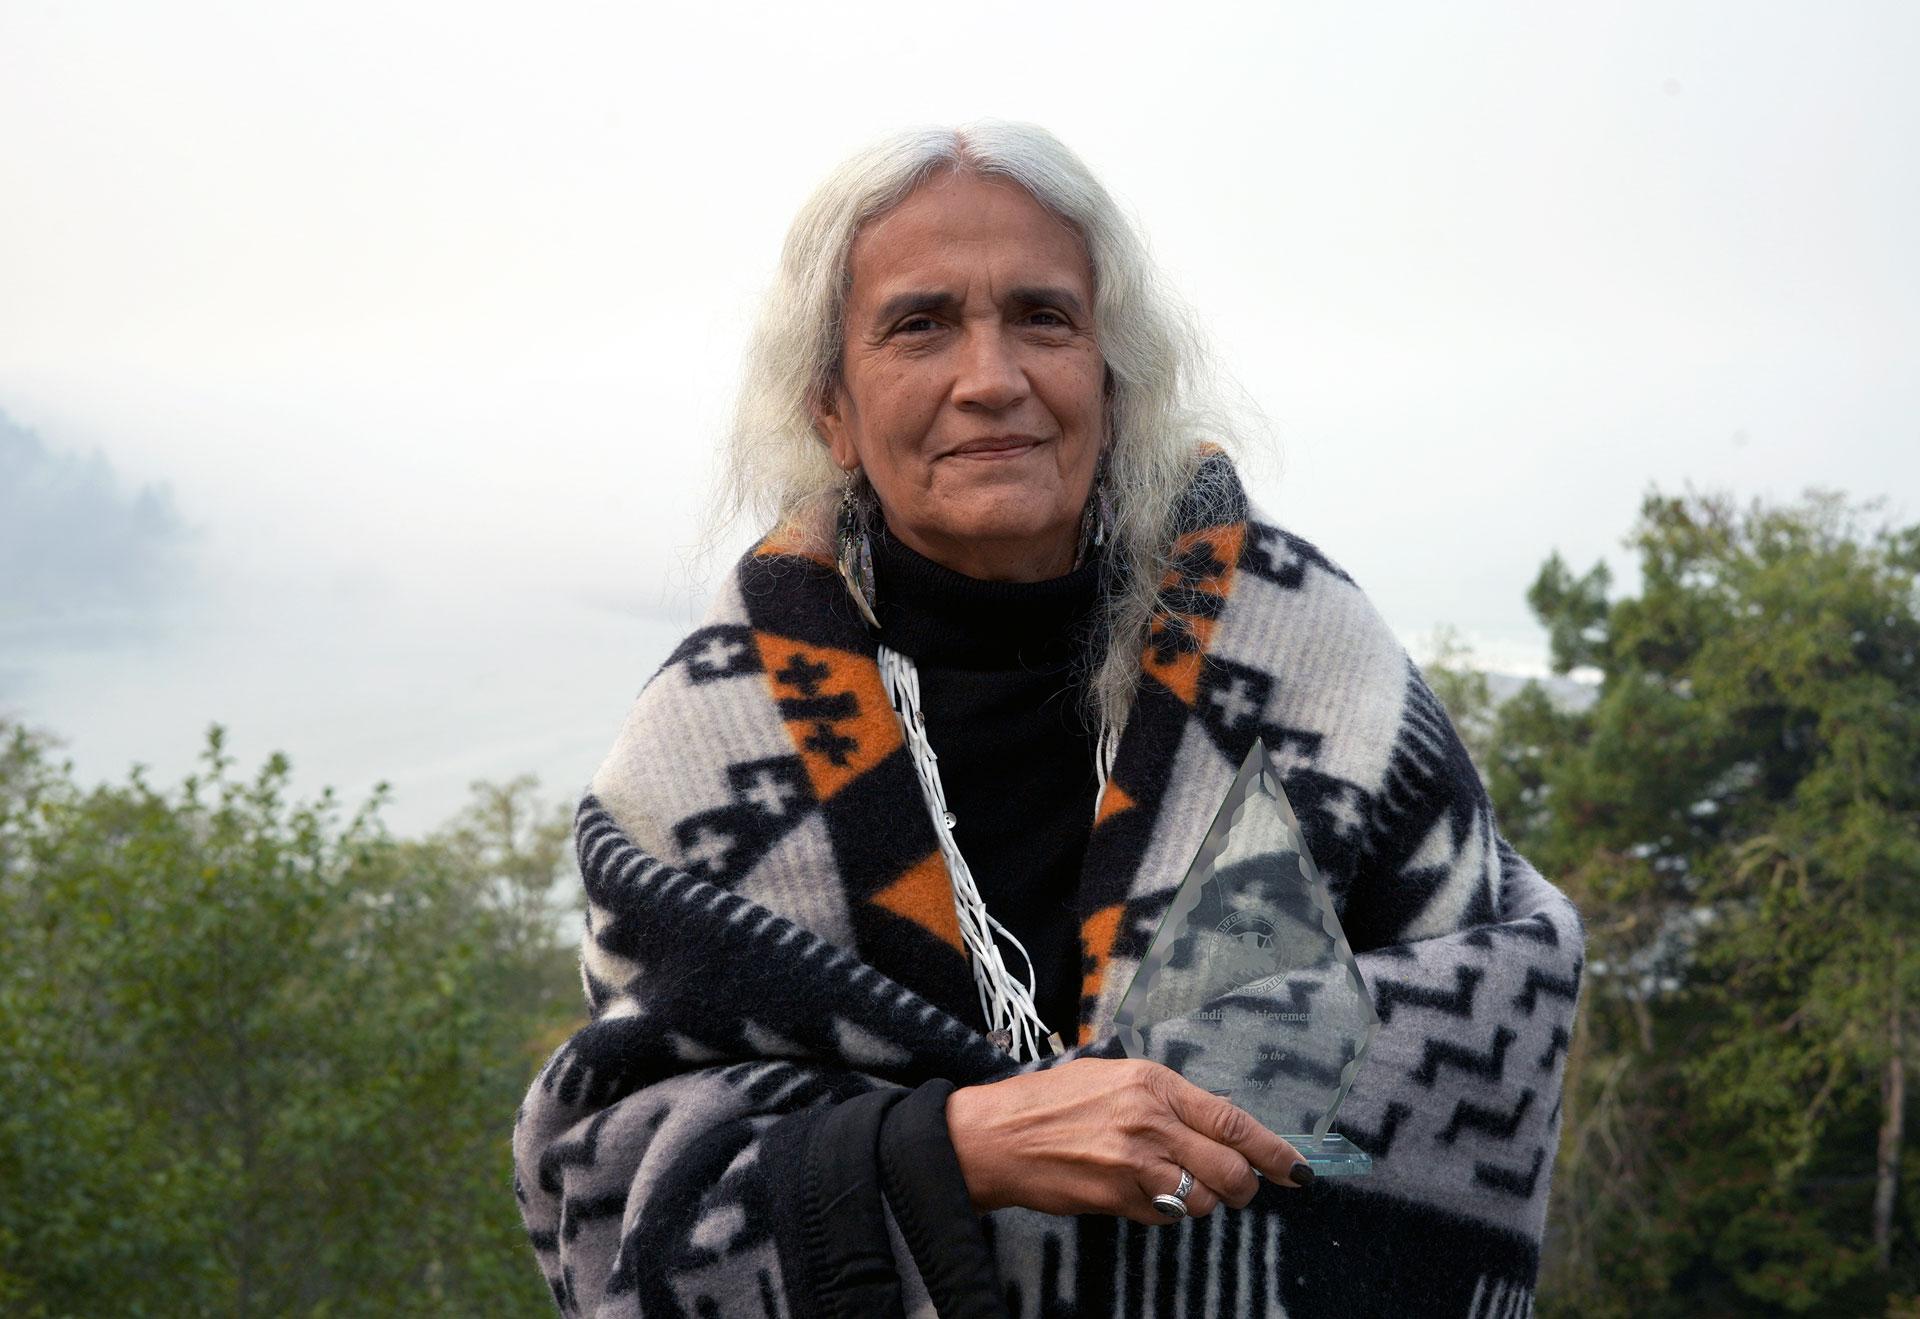 Profile shot of Judge Abby Abinanti standing outside